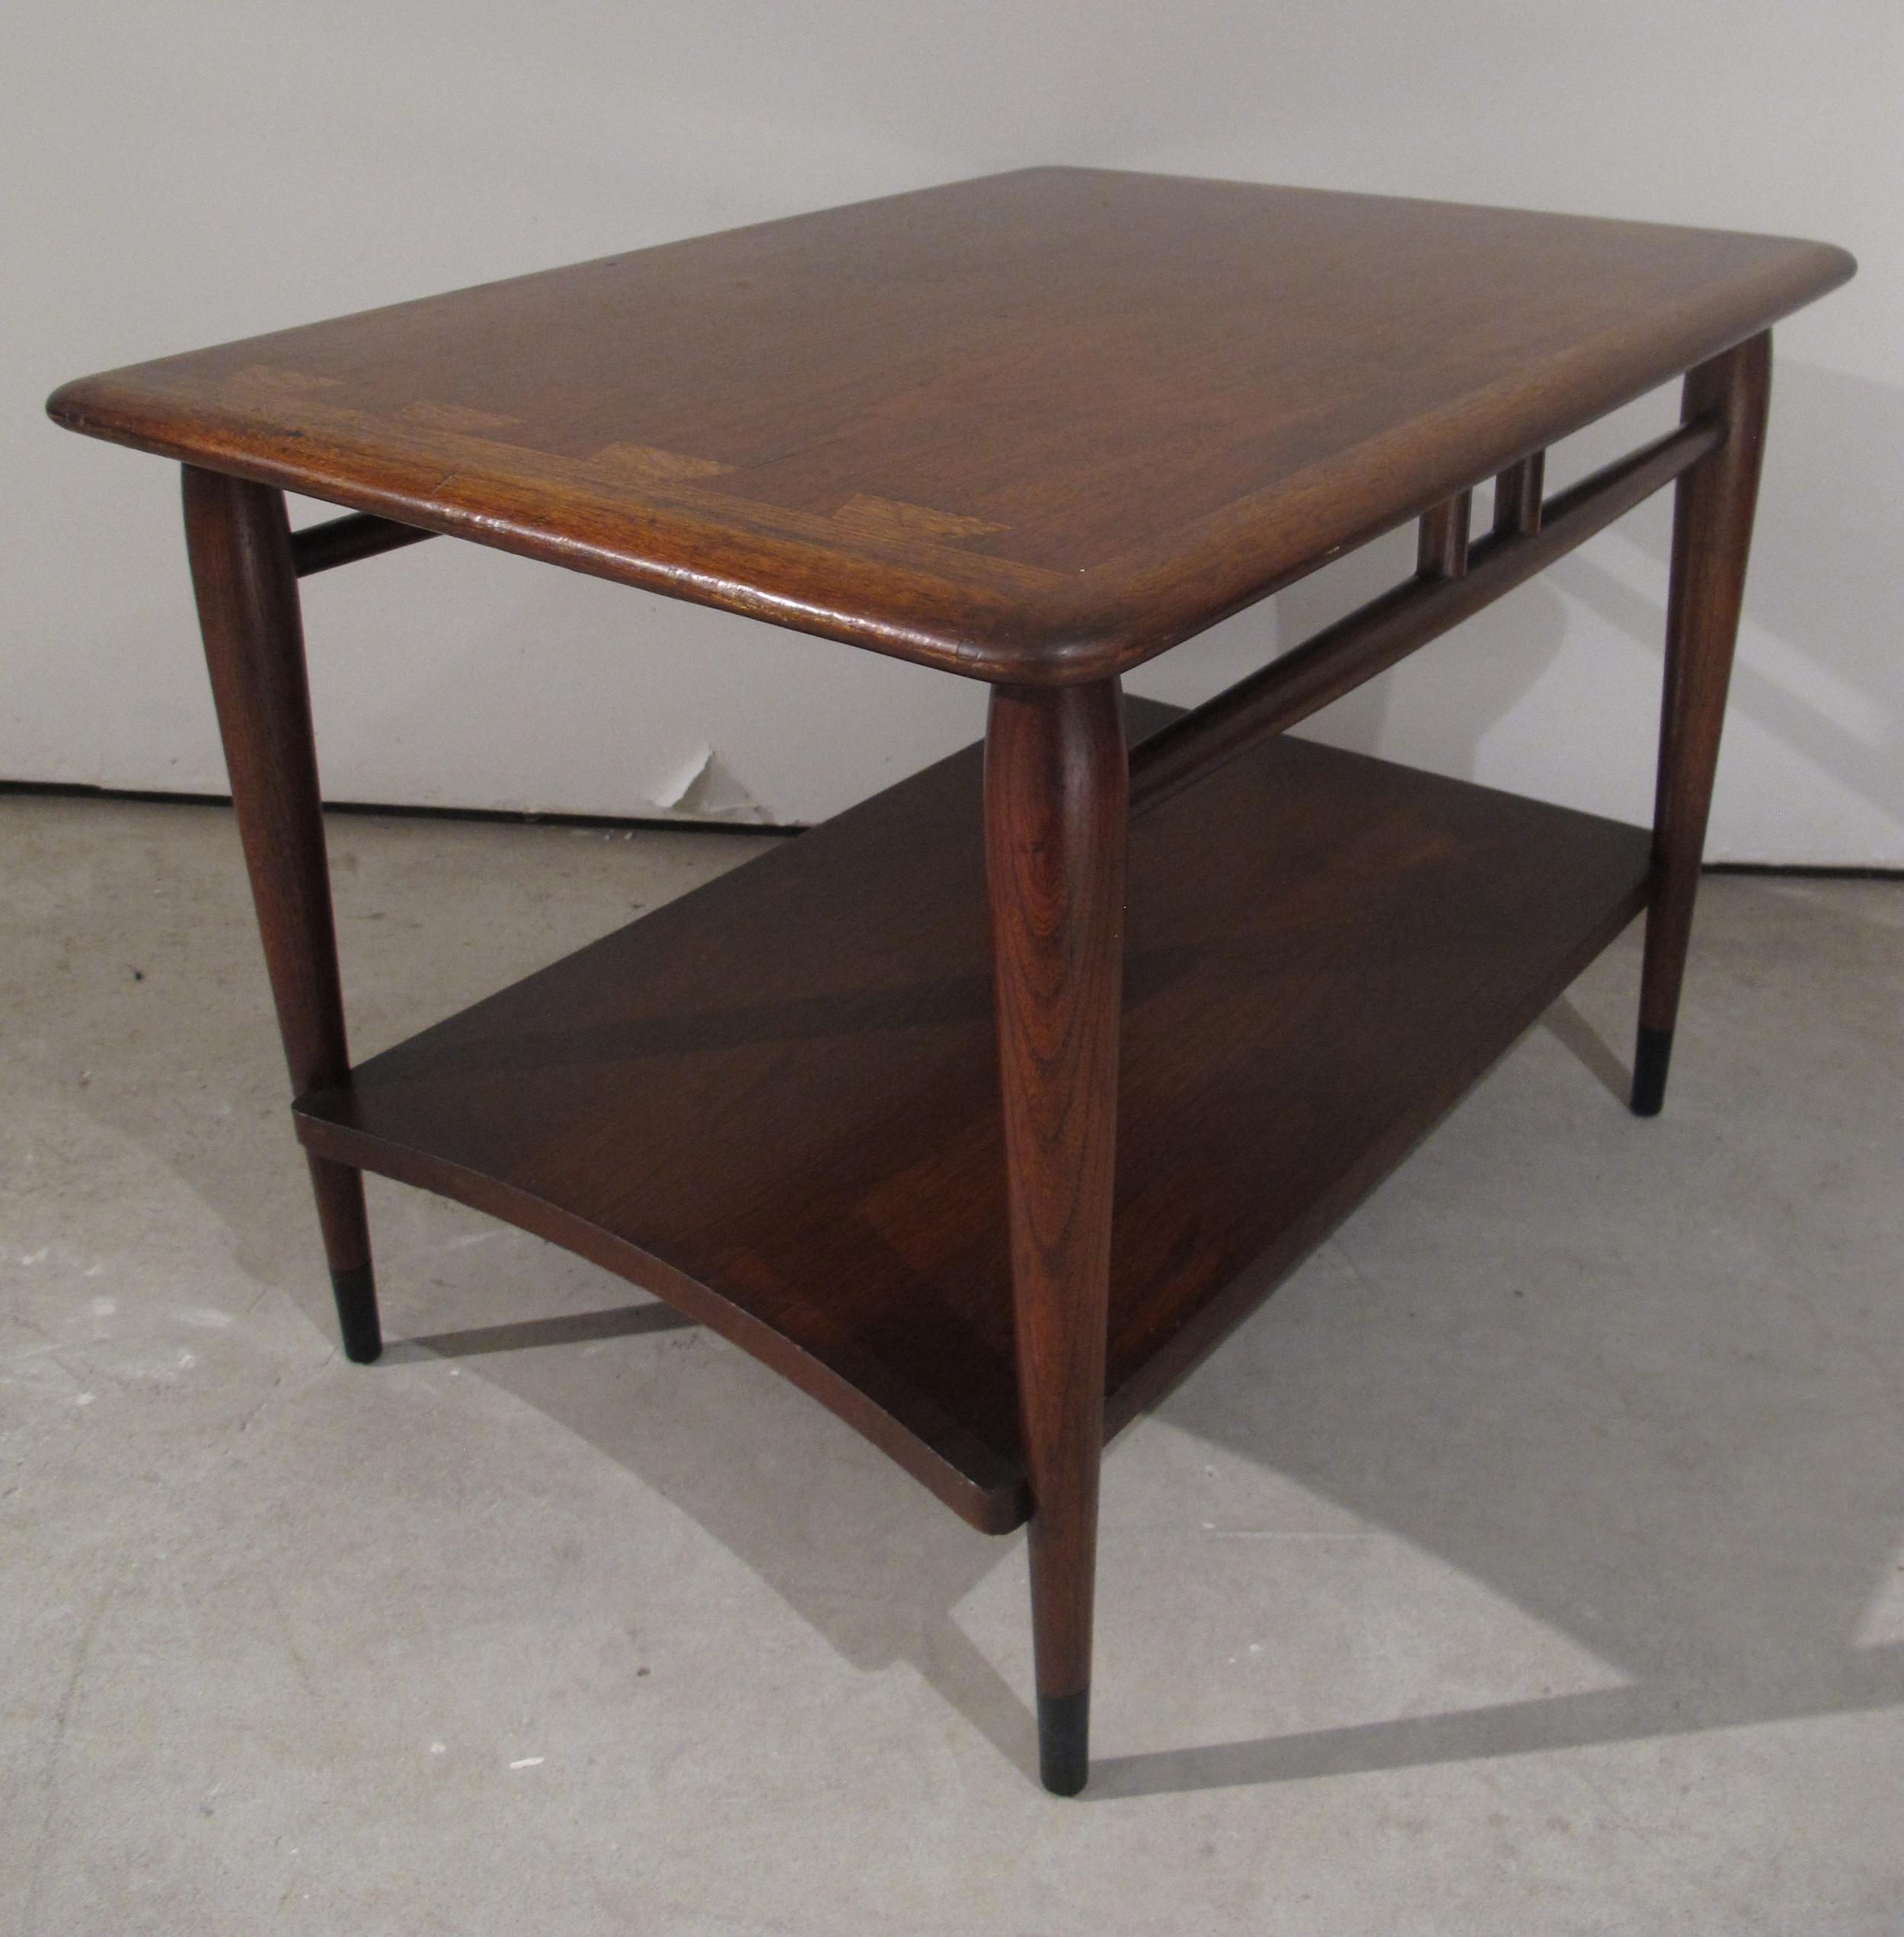 LANE ACCLAIM SIDE TABLE